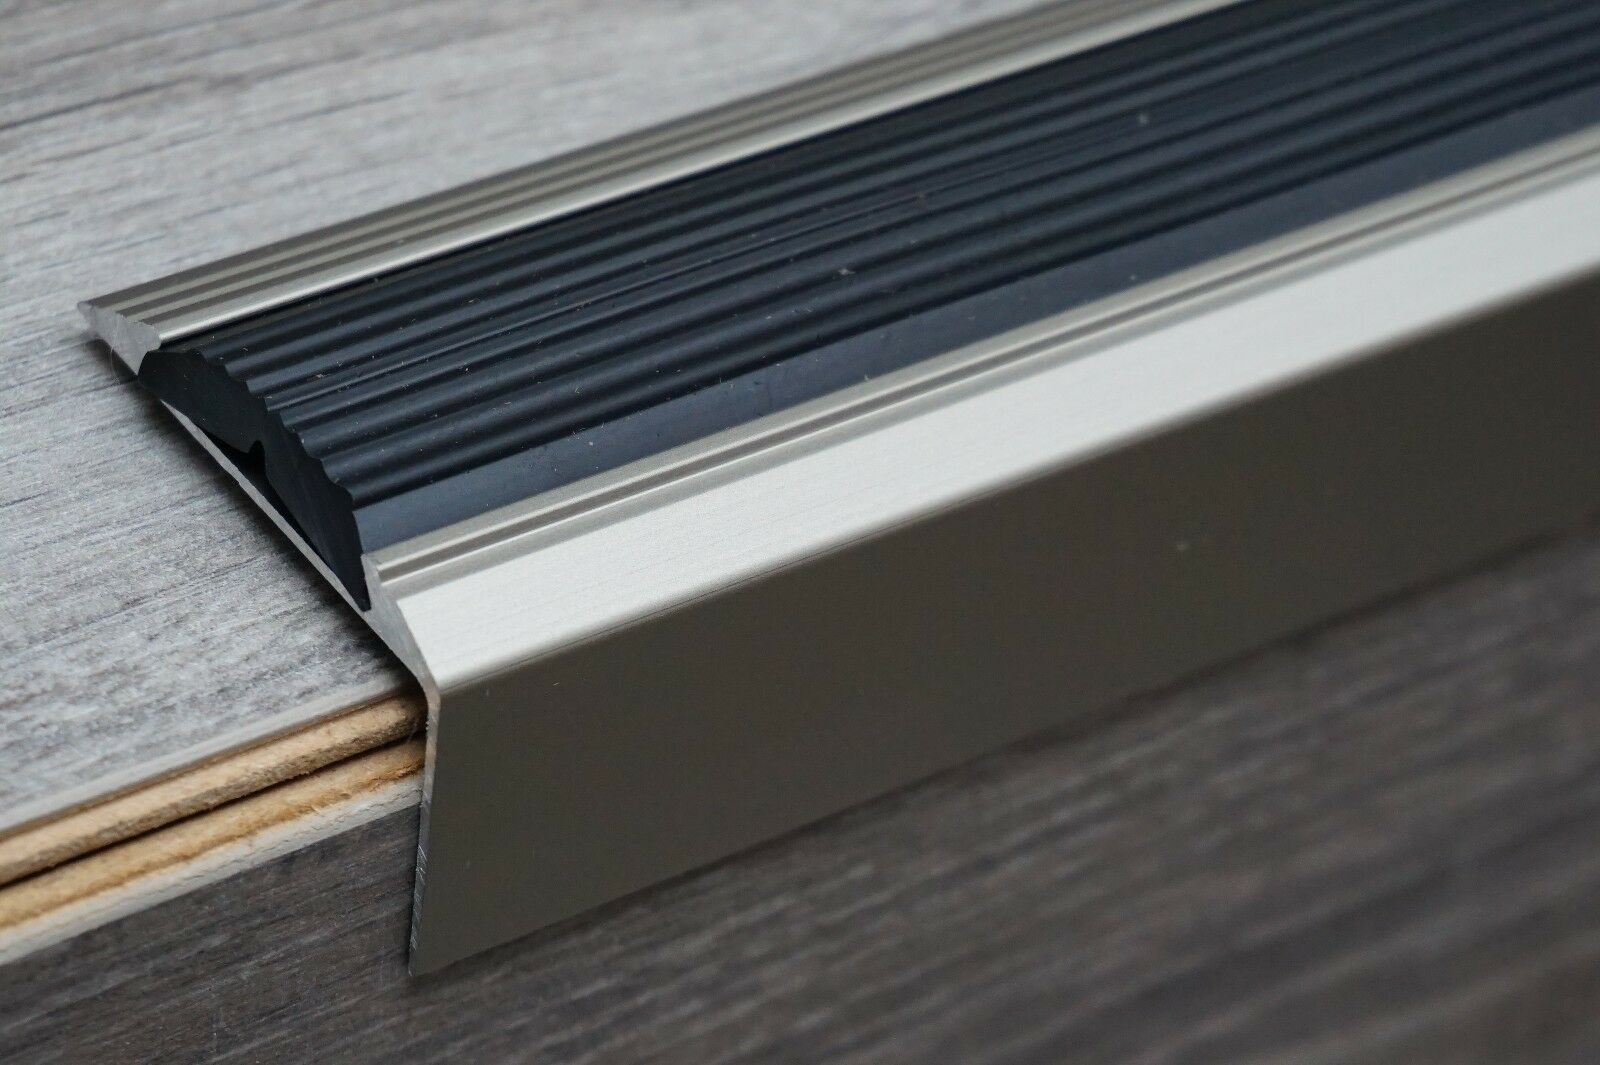 120 cm INOX aluminium antislip trappen profiel trapprofiel hoek profiel trapkant